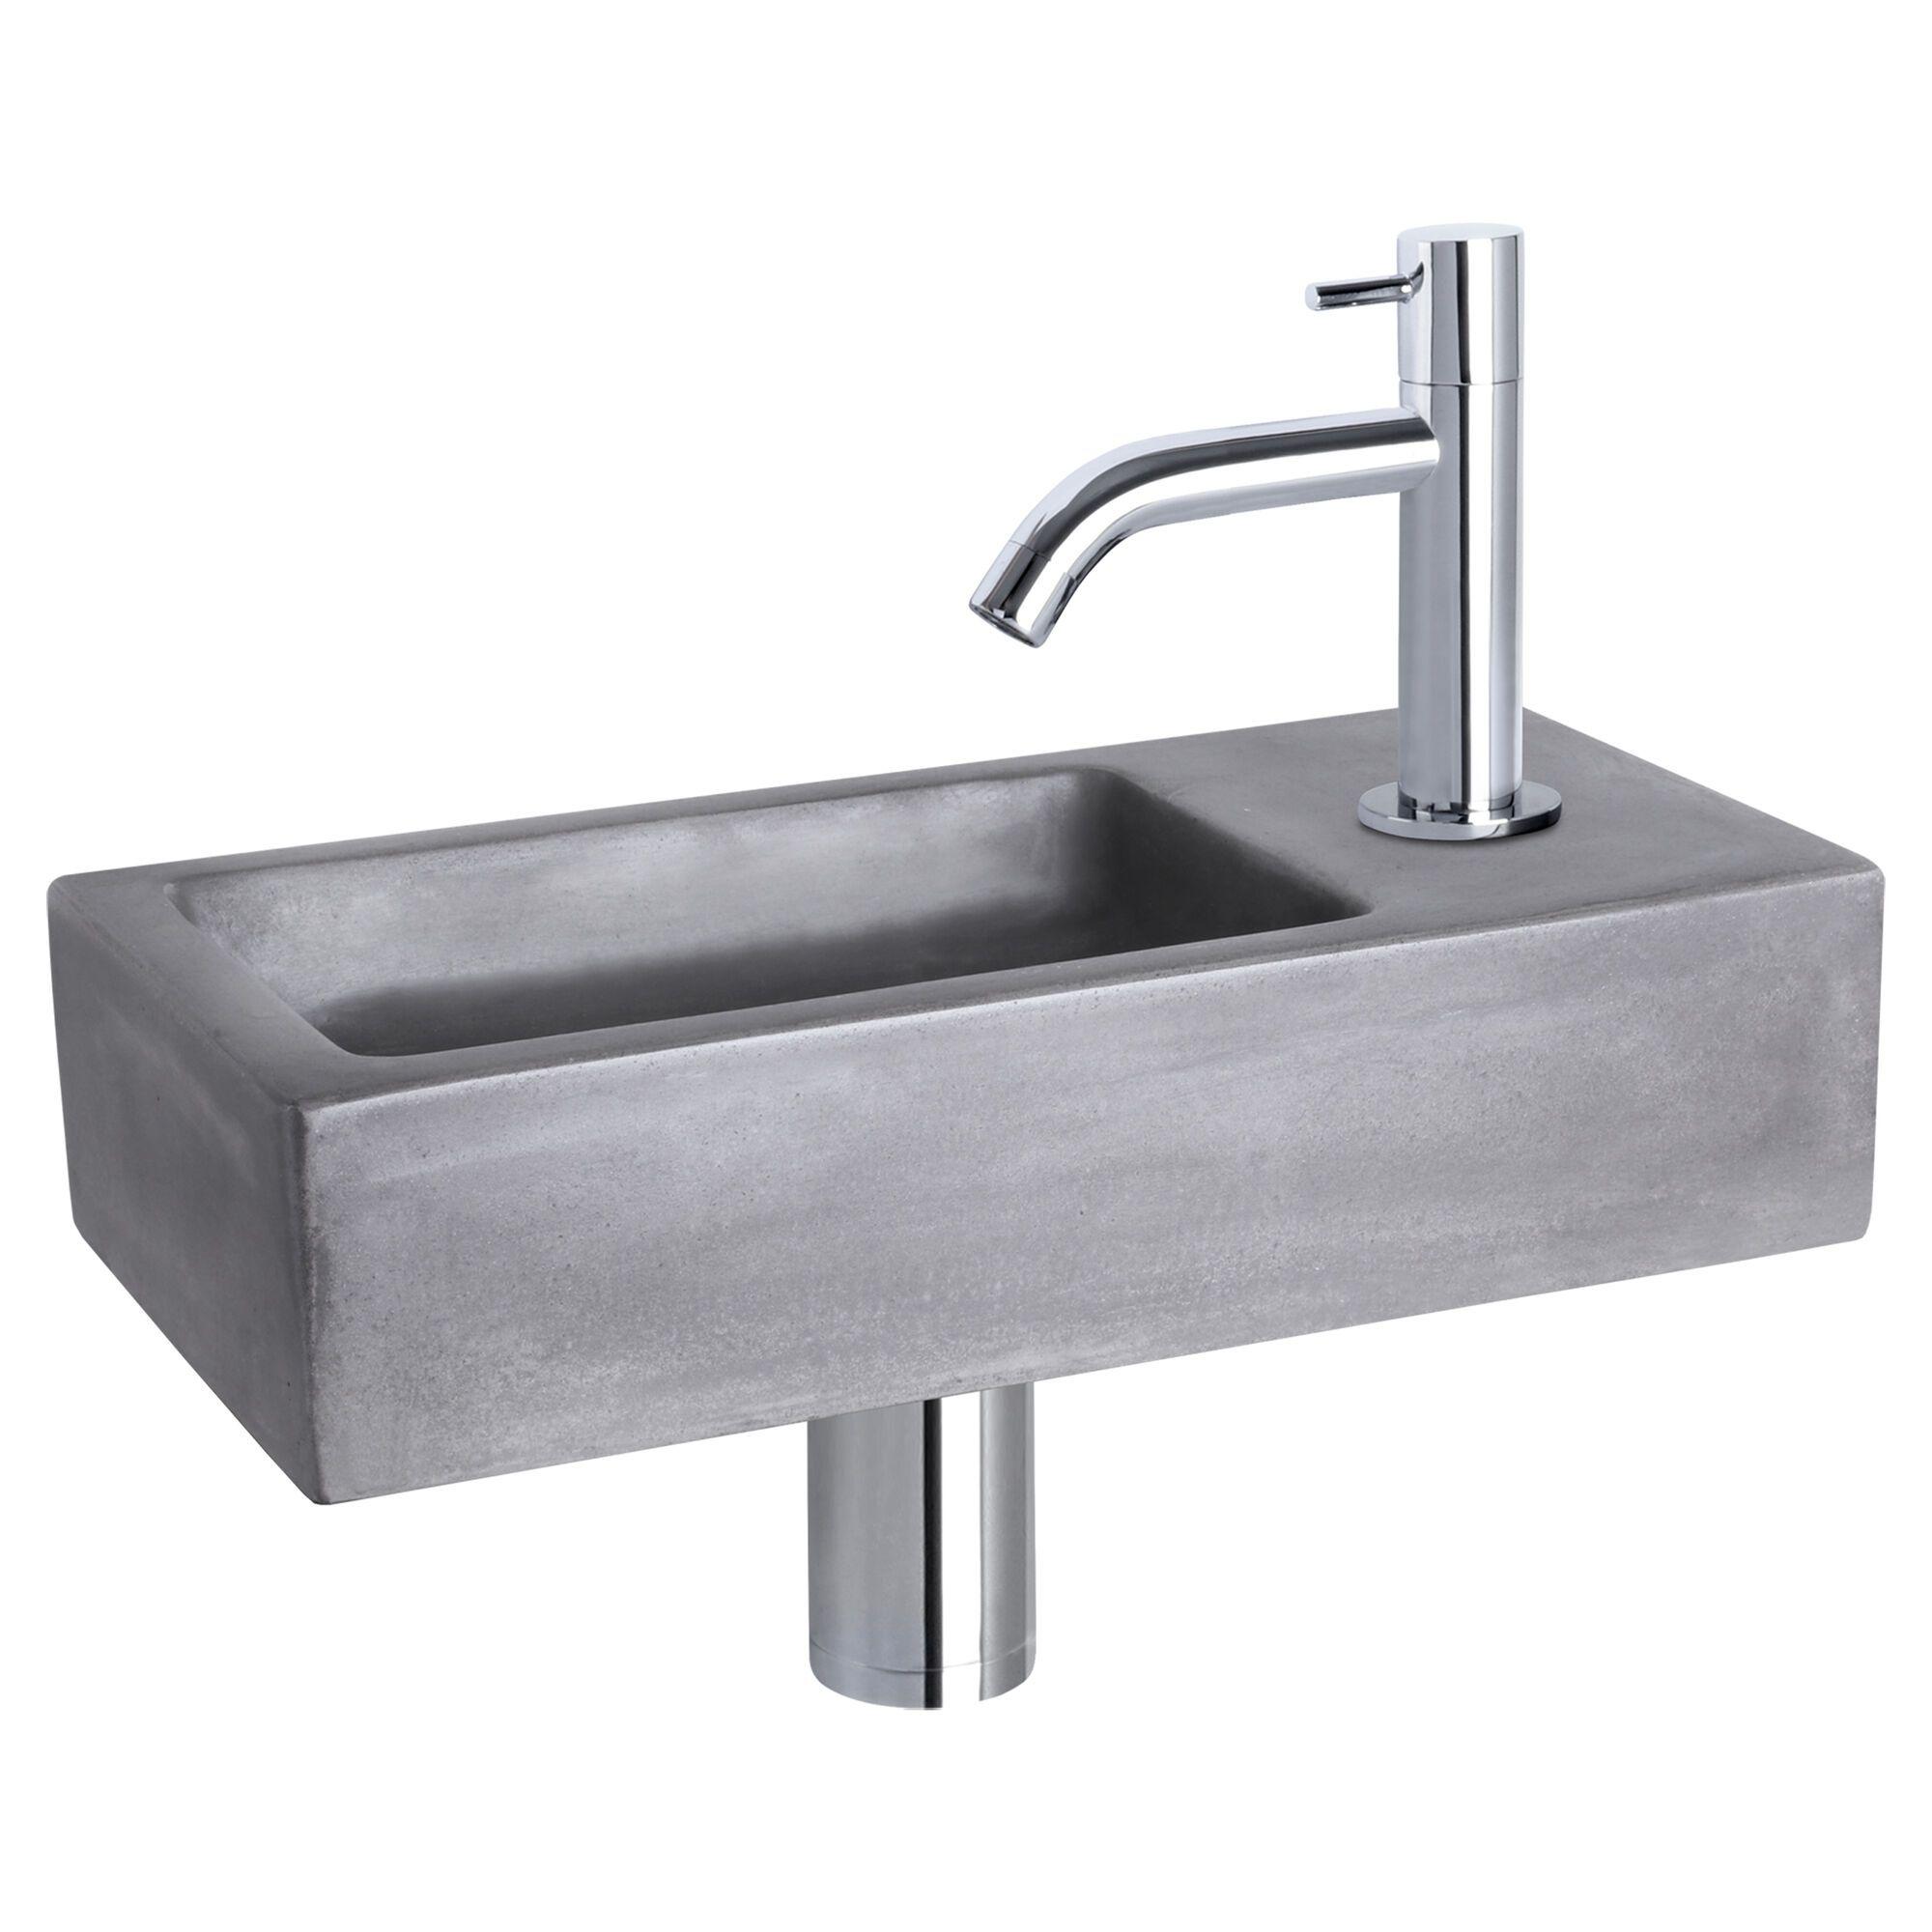 WC Fontein Hura Gebogen Kraan | Fonteinset Beton met Chroom | Betonnen Wastafel